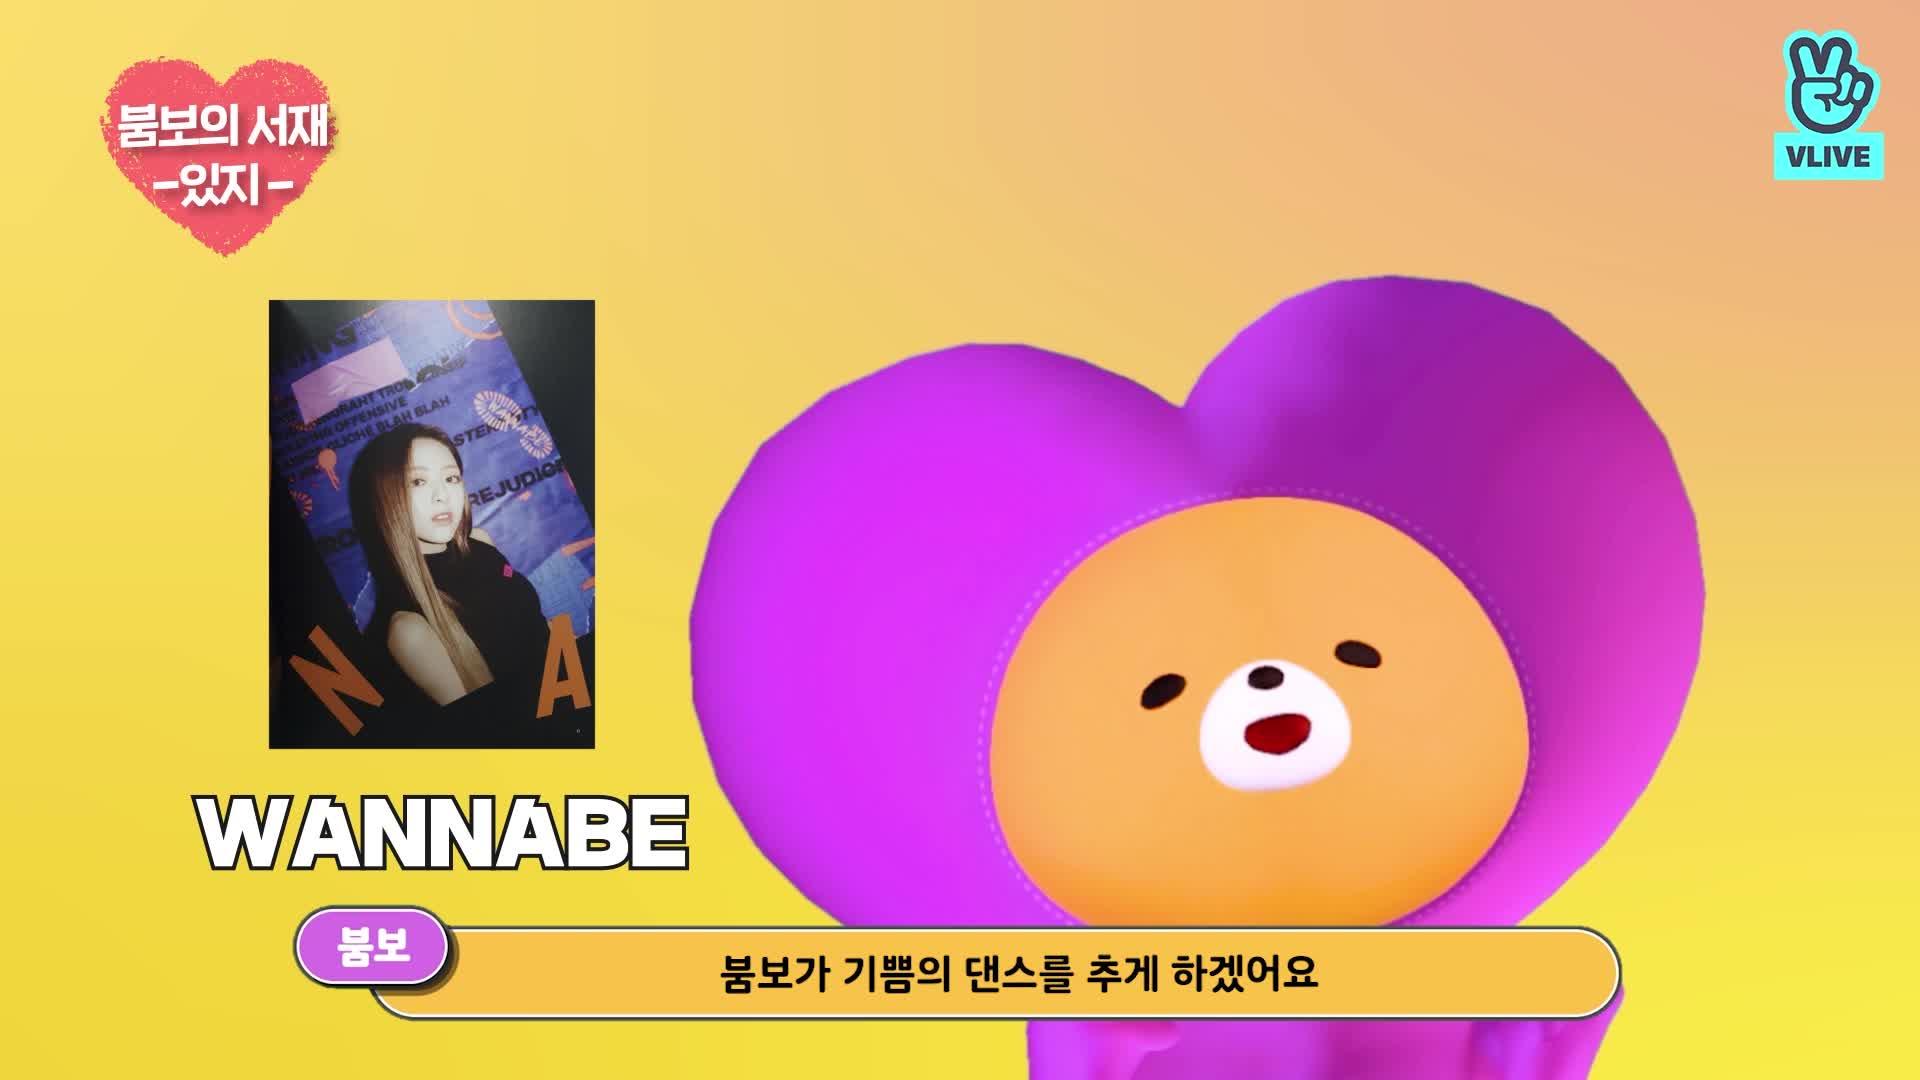 [V CREW] 붐보의 서재 - EP. 10 ITZY 미니 앨범 2집 IT'z ME 언박싱🖐🏻 (붐보의 WANNABE는 IT지 뿐이지..🤭❤️)